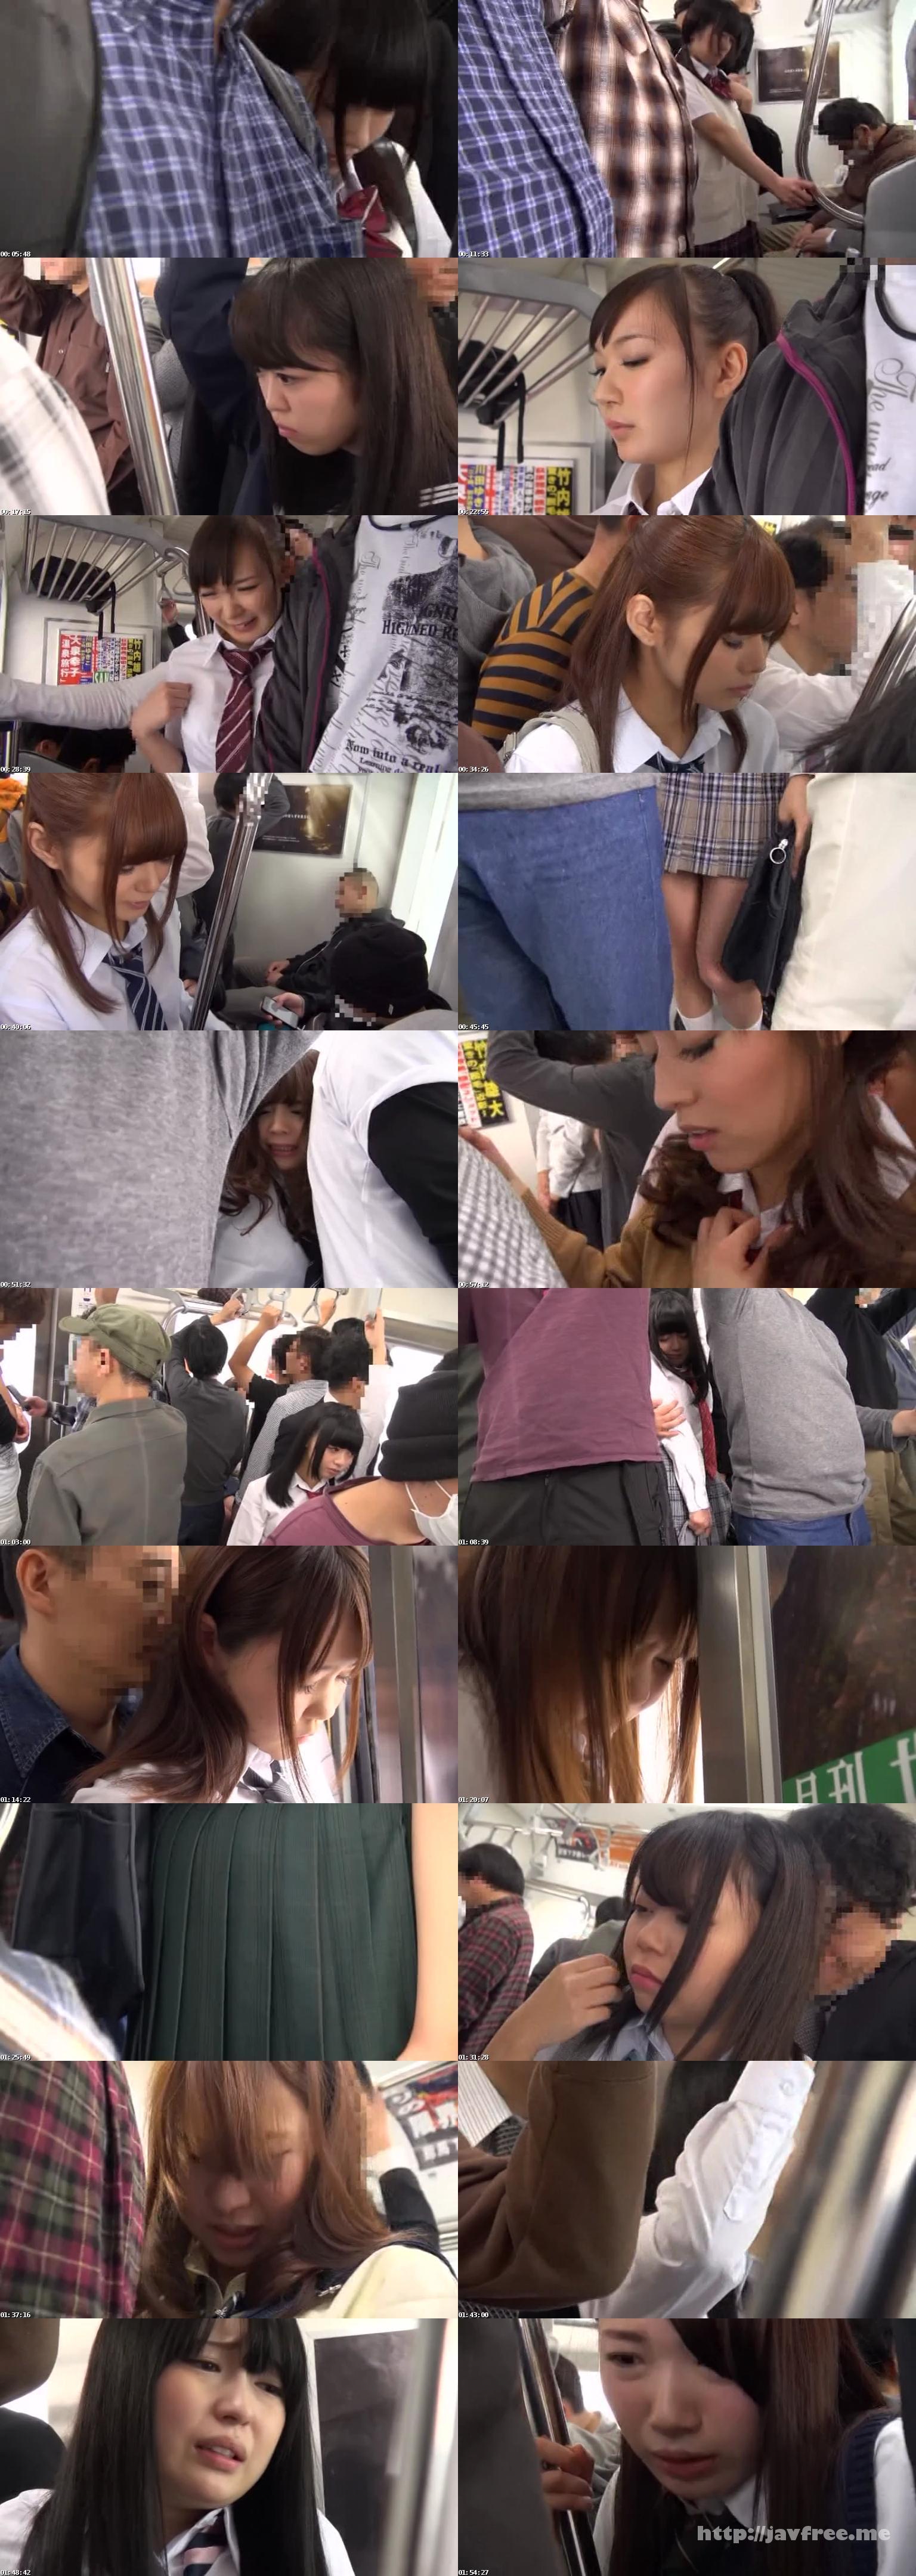 [AOZ-221Z] JKスカートぶっかけ痴漢盗撮 - image AOZ-221Z on https://javfree.me